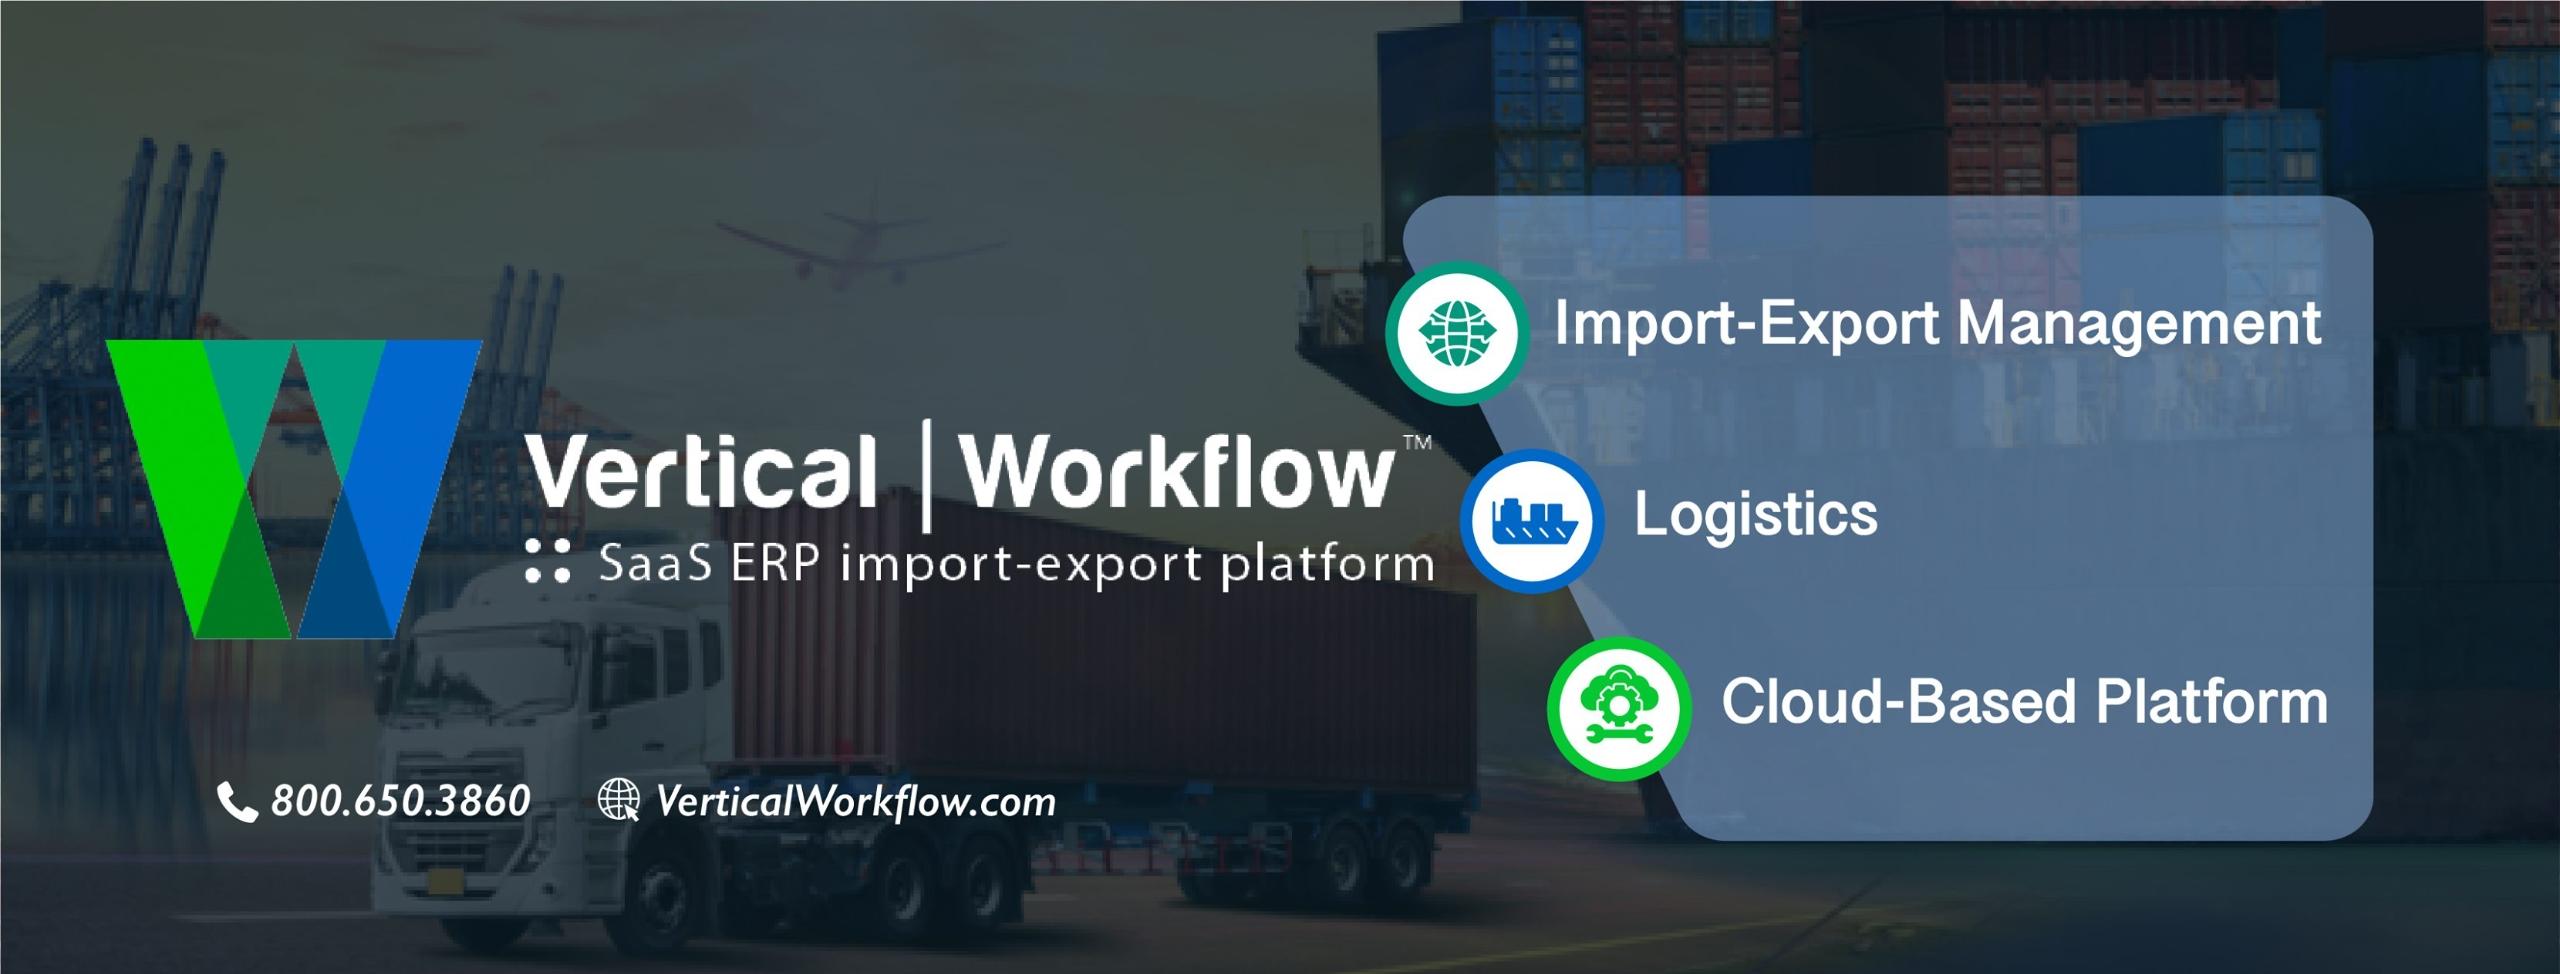 verticalworkflow (@verticalworkflow) Cover Image